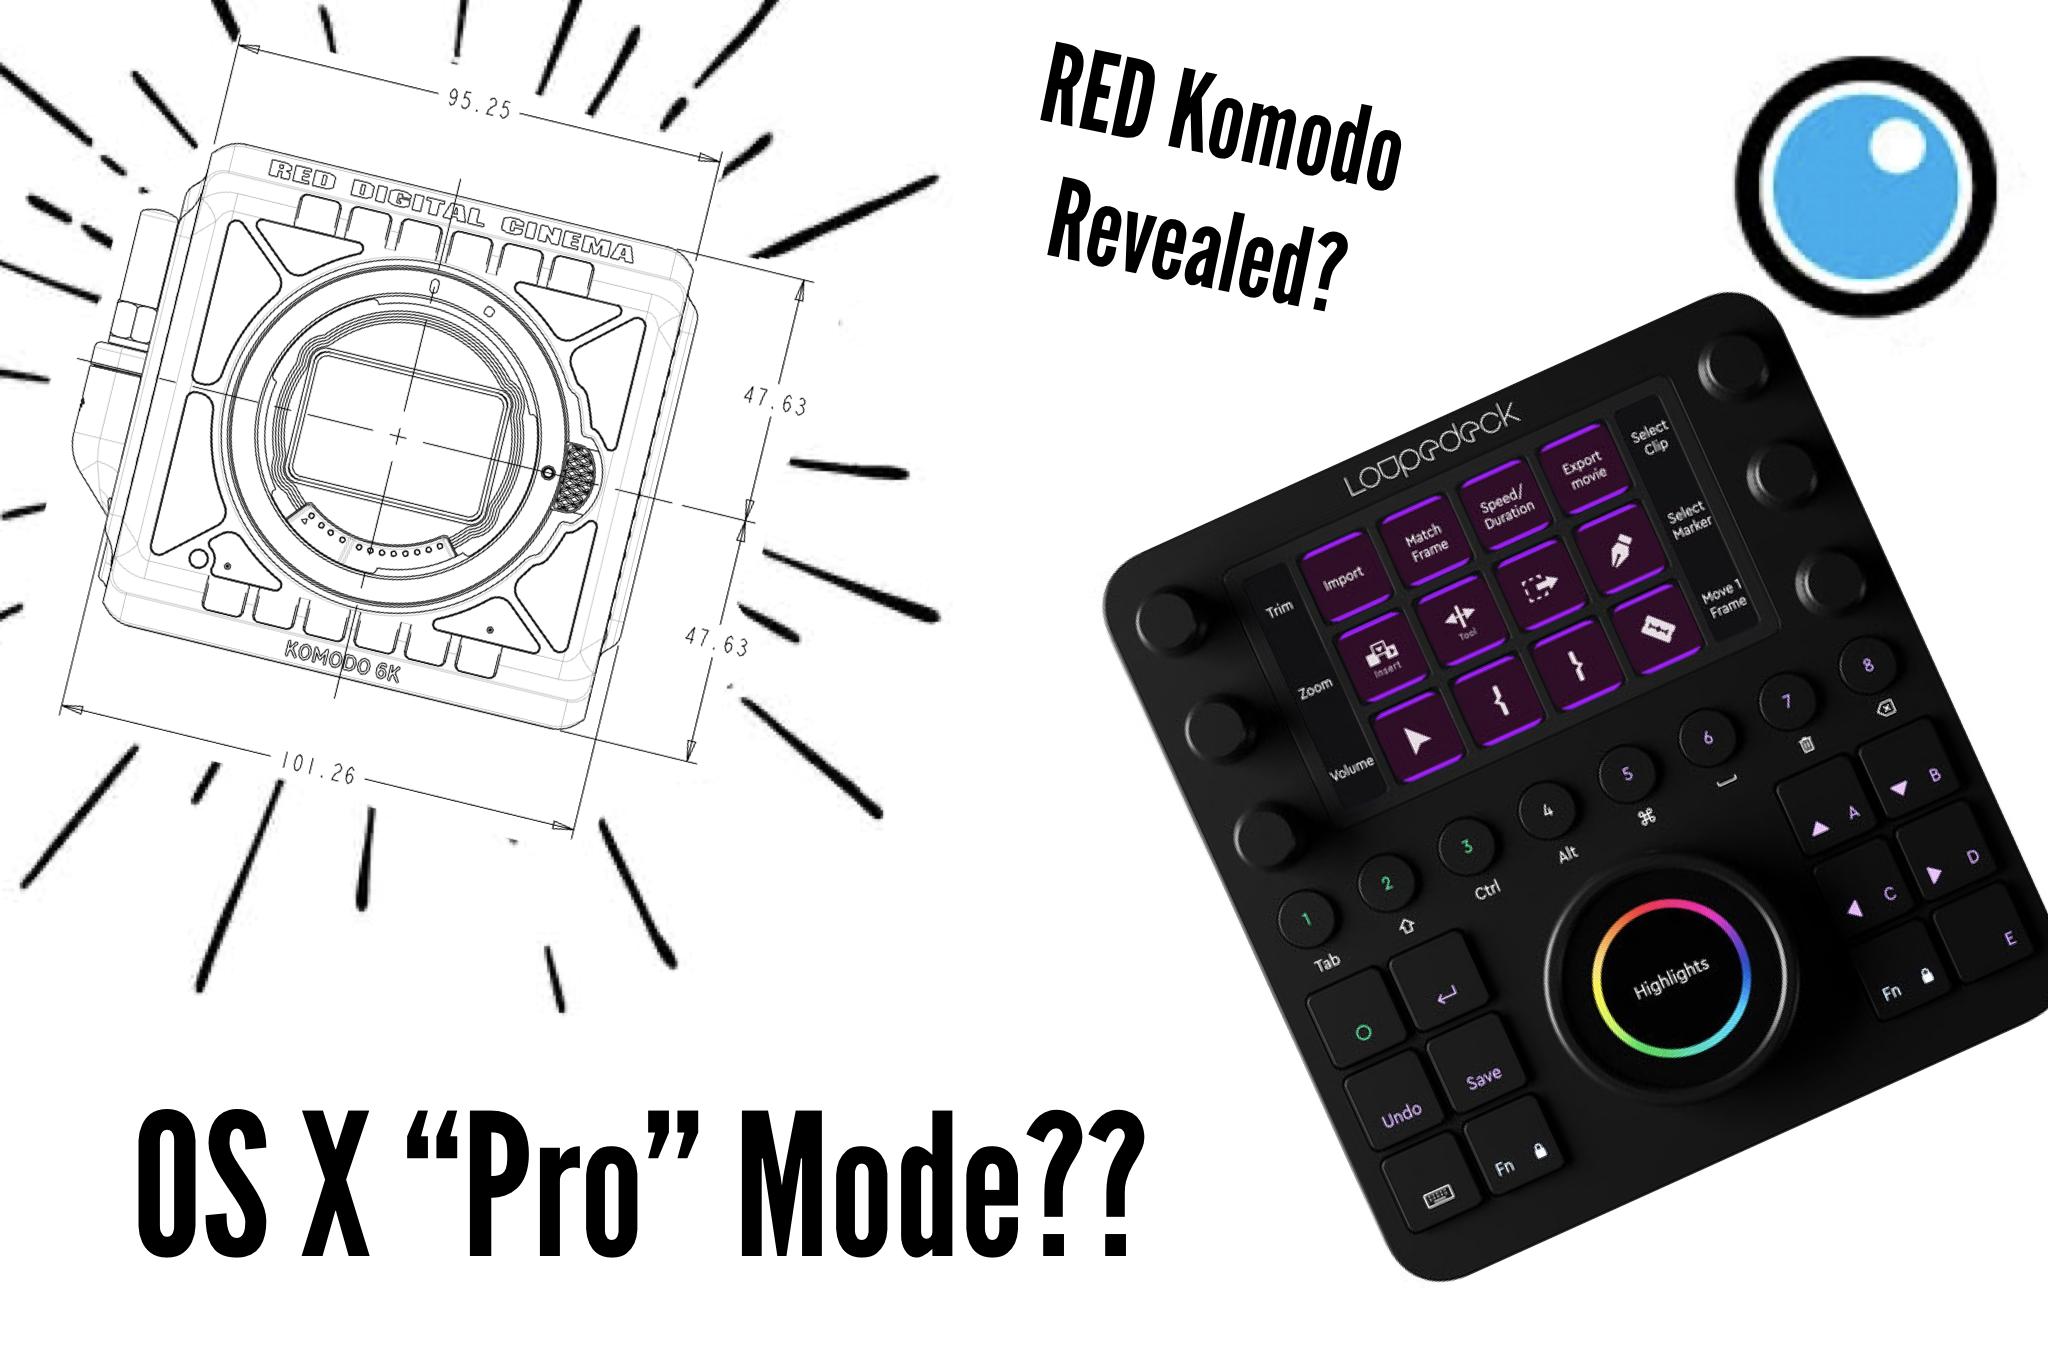 RED Komodo, Loupedeck, OS X Pro PVC podcast eps 12